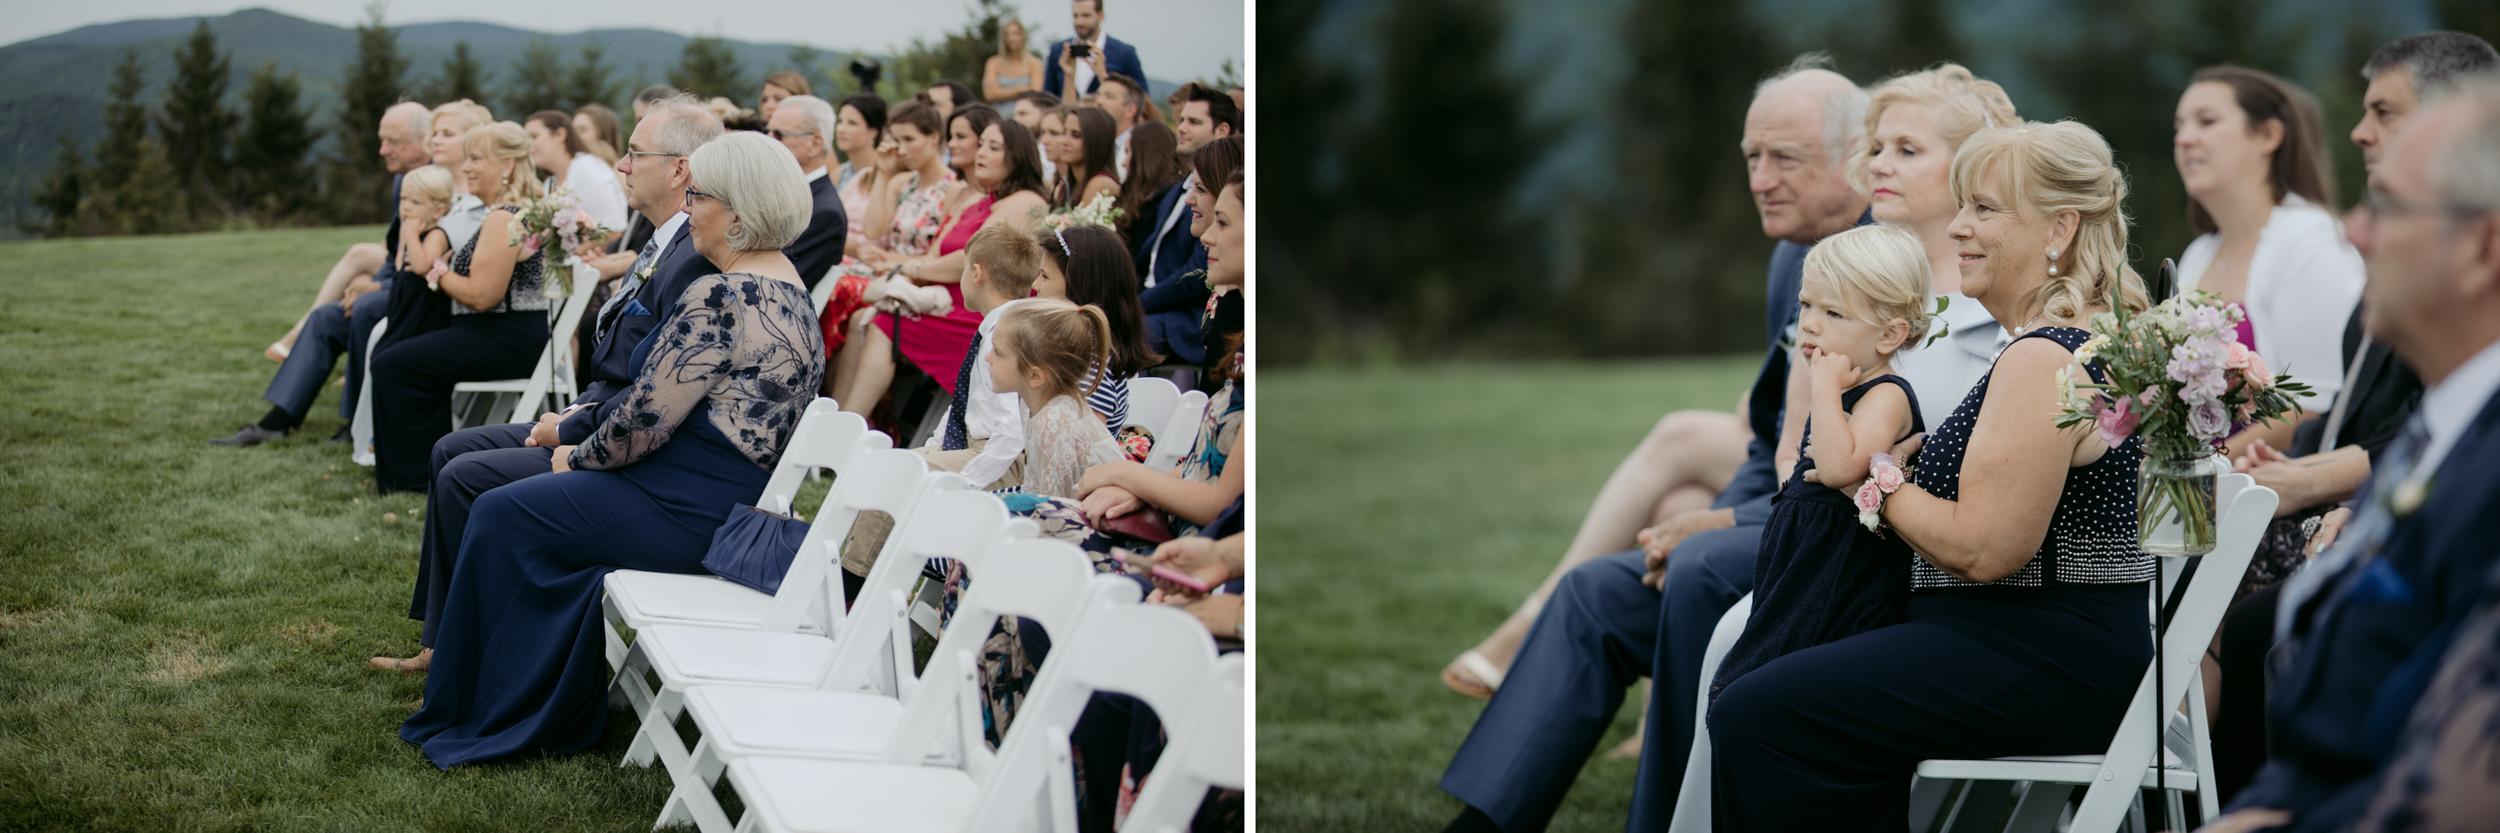 point_lookout_northport_Maine_Midcoast_wedding_leslie_justin-14.jpg